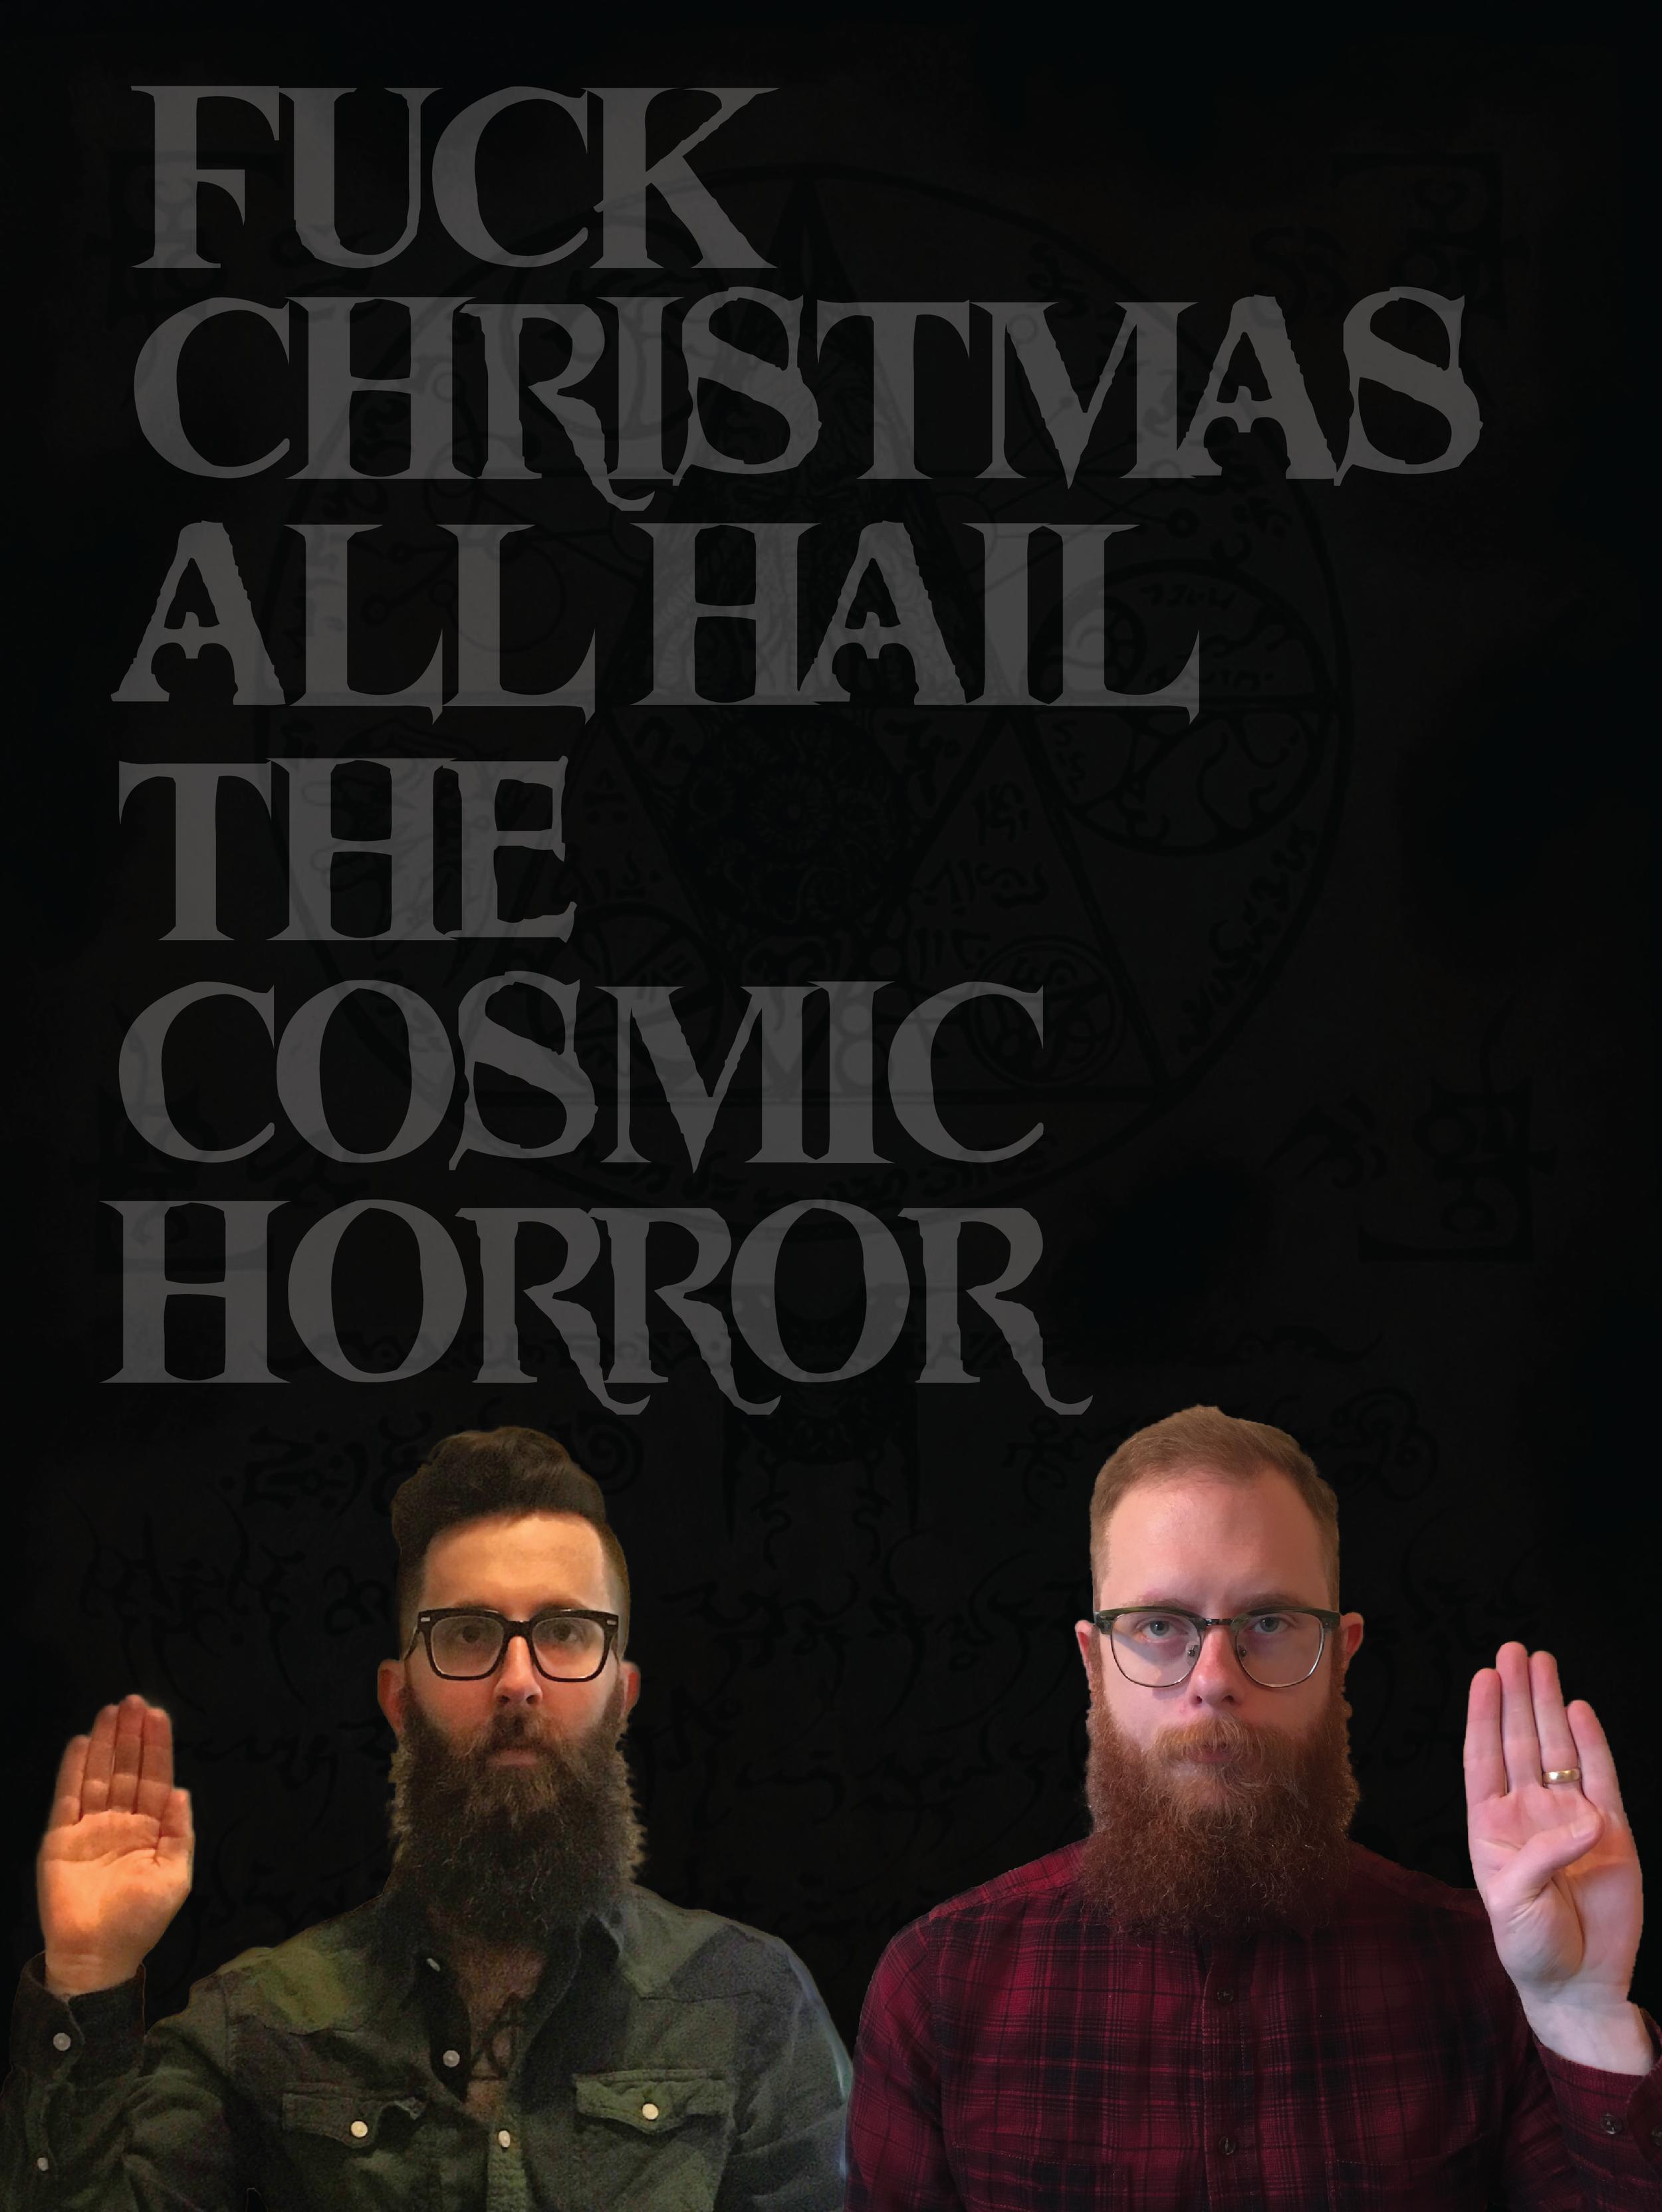 Card 10 (Horror Cosmic).png